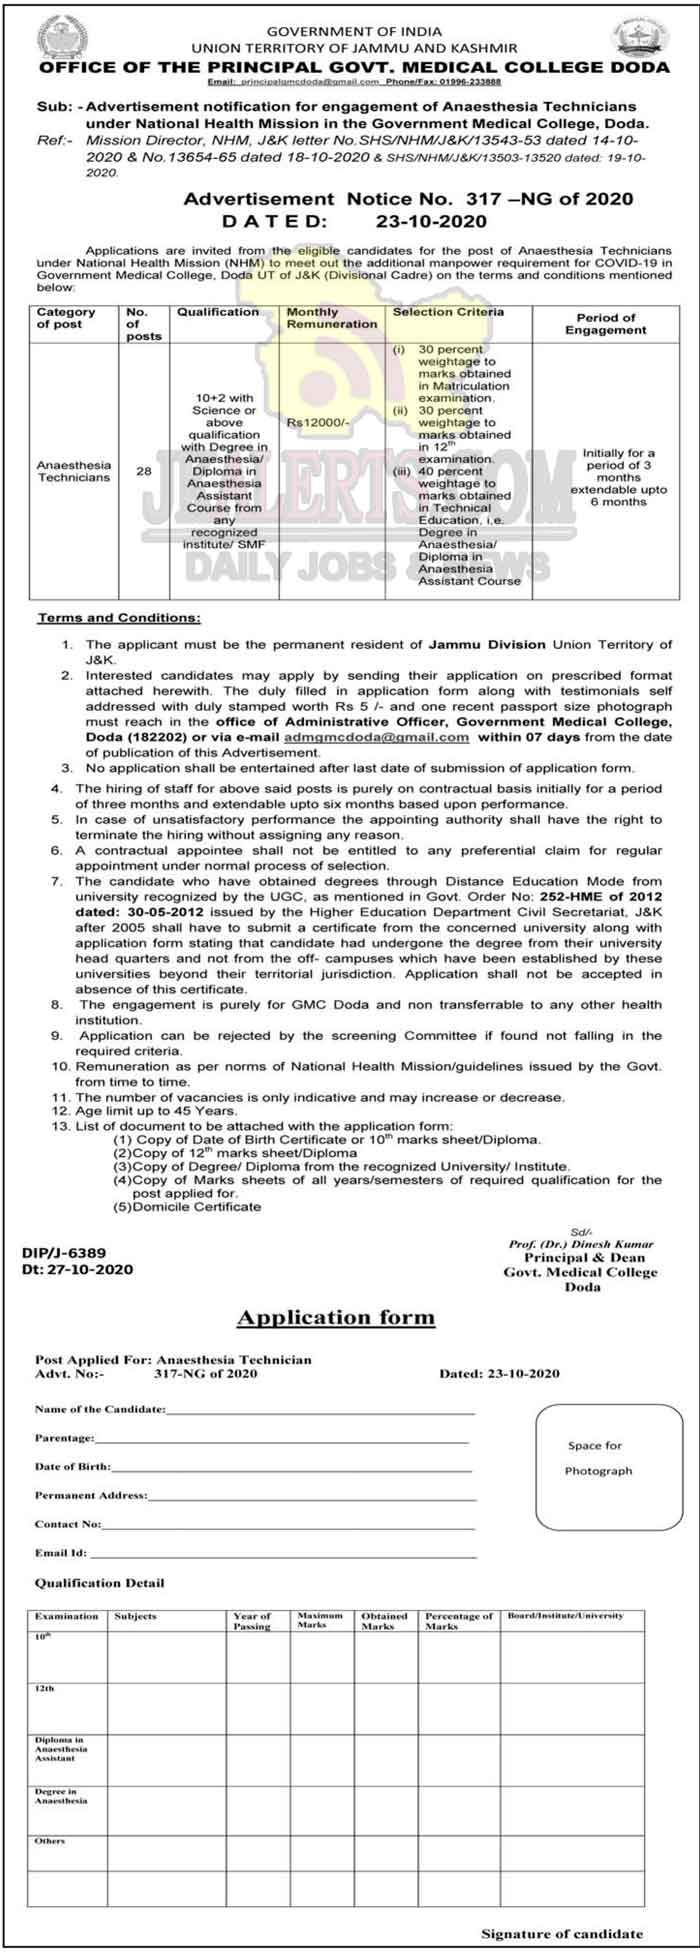 GMC Doda Anaesthesia Technicians Jobs recruitment under NHM.